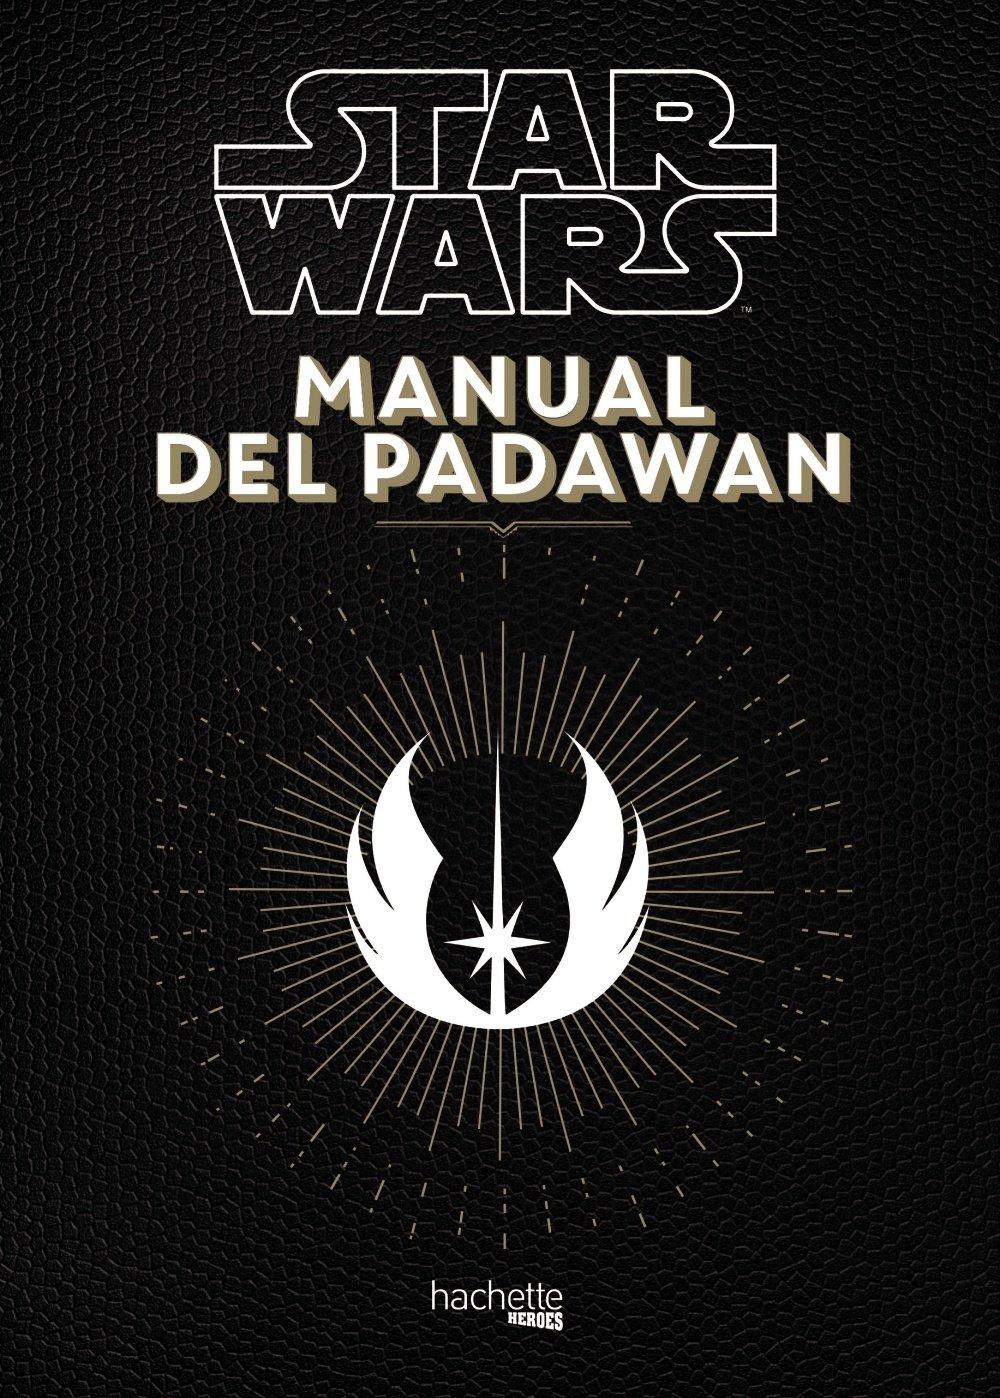 Manual del Padawan Hachette Heroes - Star Wars - Especializados: Amazon.es: Beaujouan, Nicolas, Touboul, Philippe, Servei Gràfic NJR: Libros